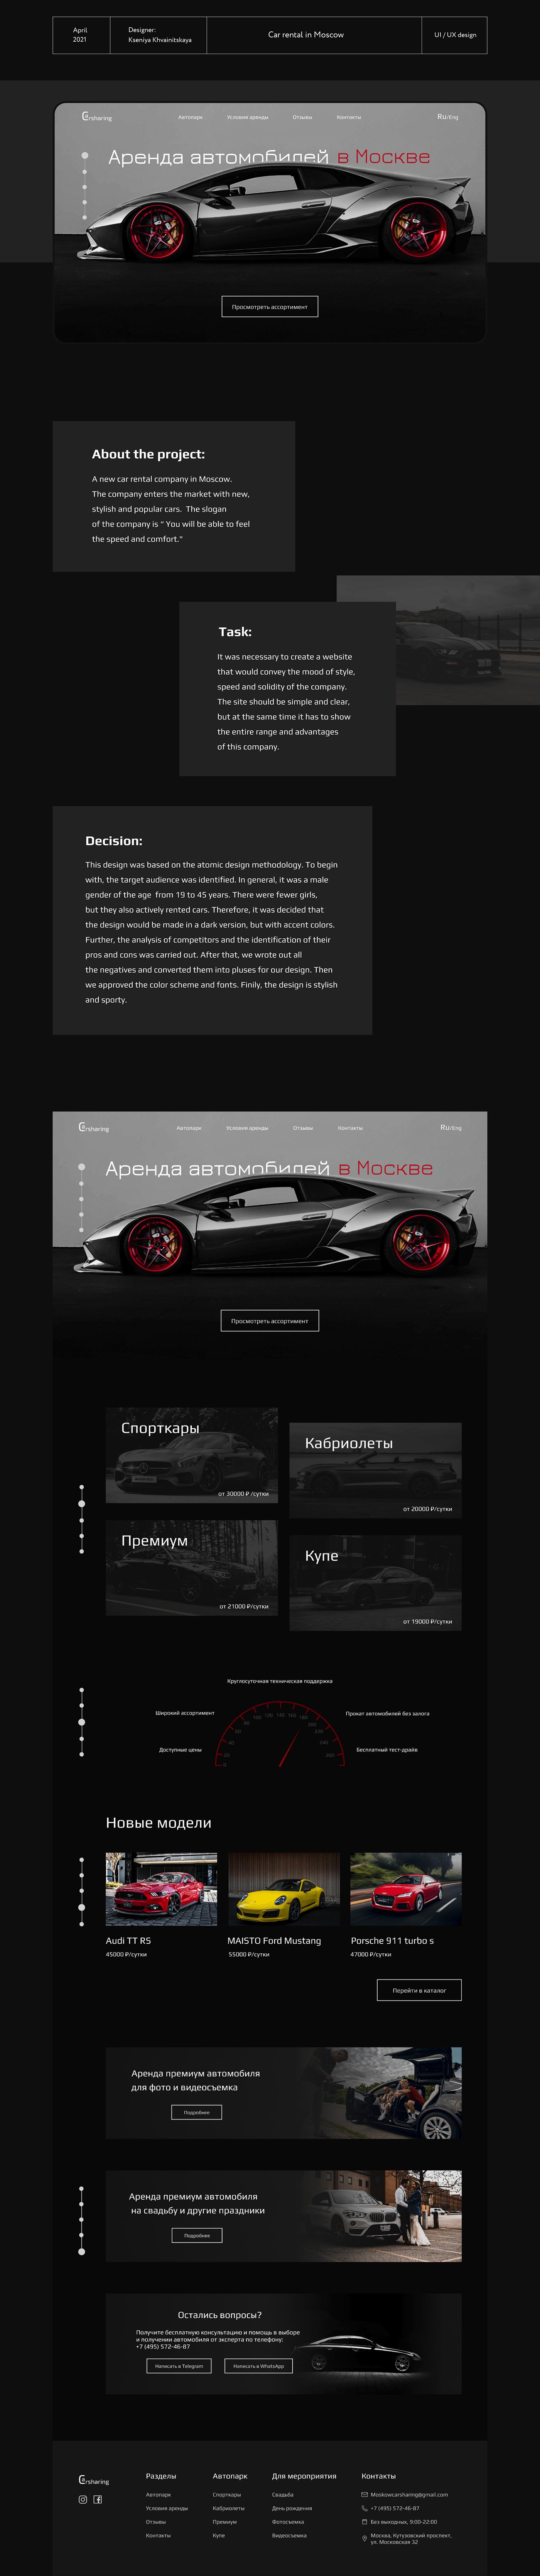 car Carsharing design Figma photoshop UI UI/UX ux Web Web Design